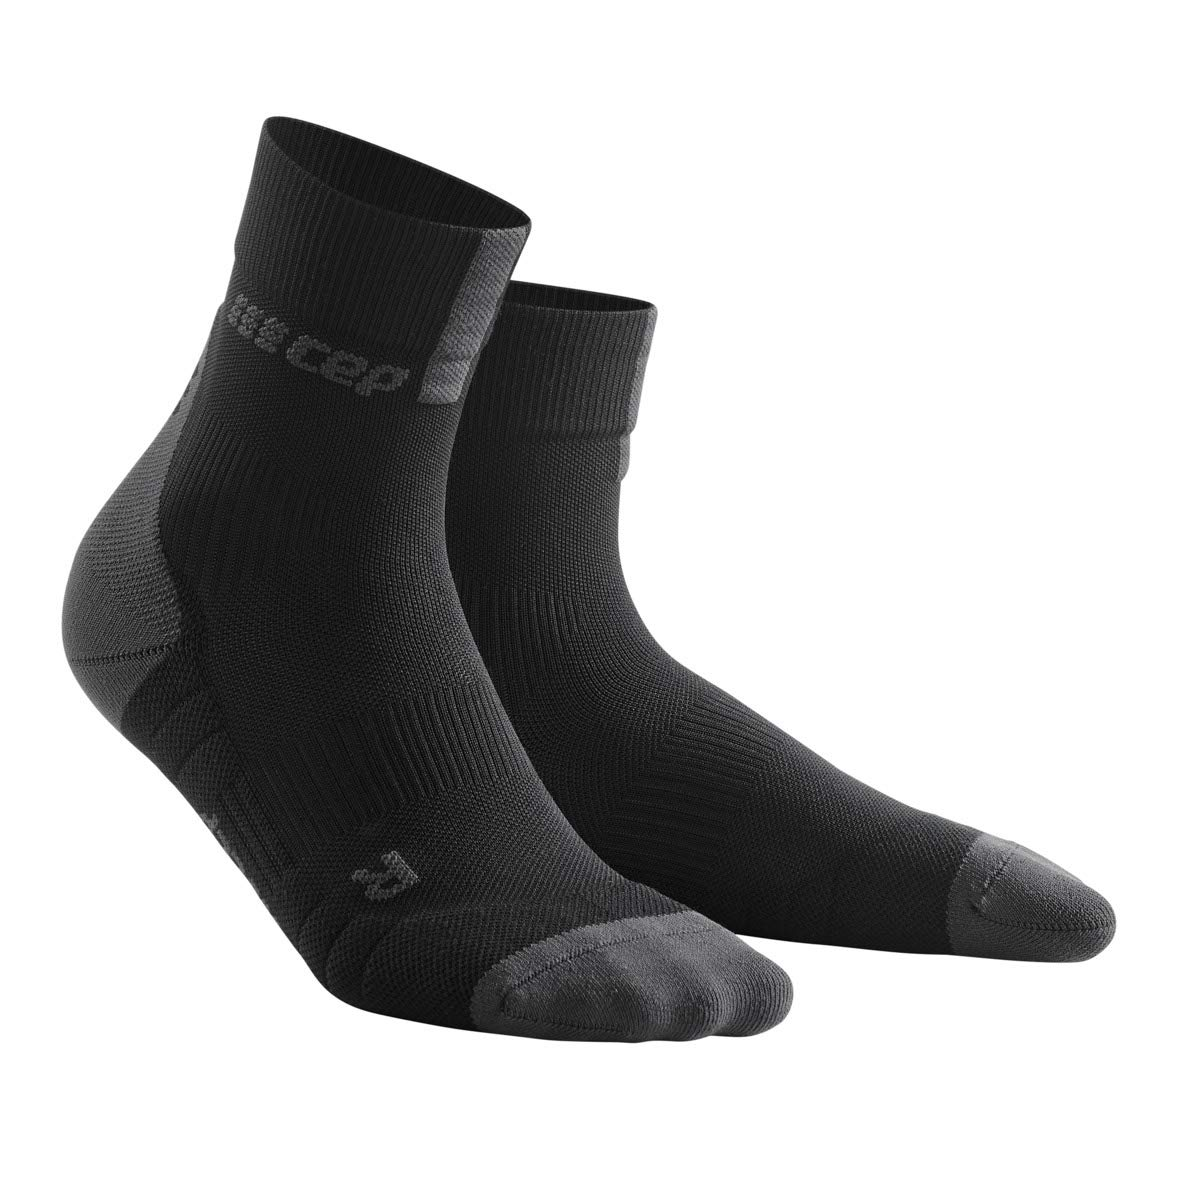 CEP Women's Short Crew 3.0 Compression Running Socks